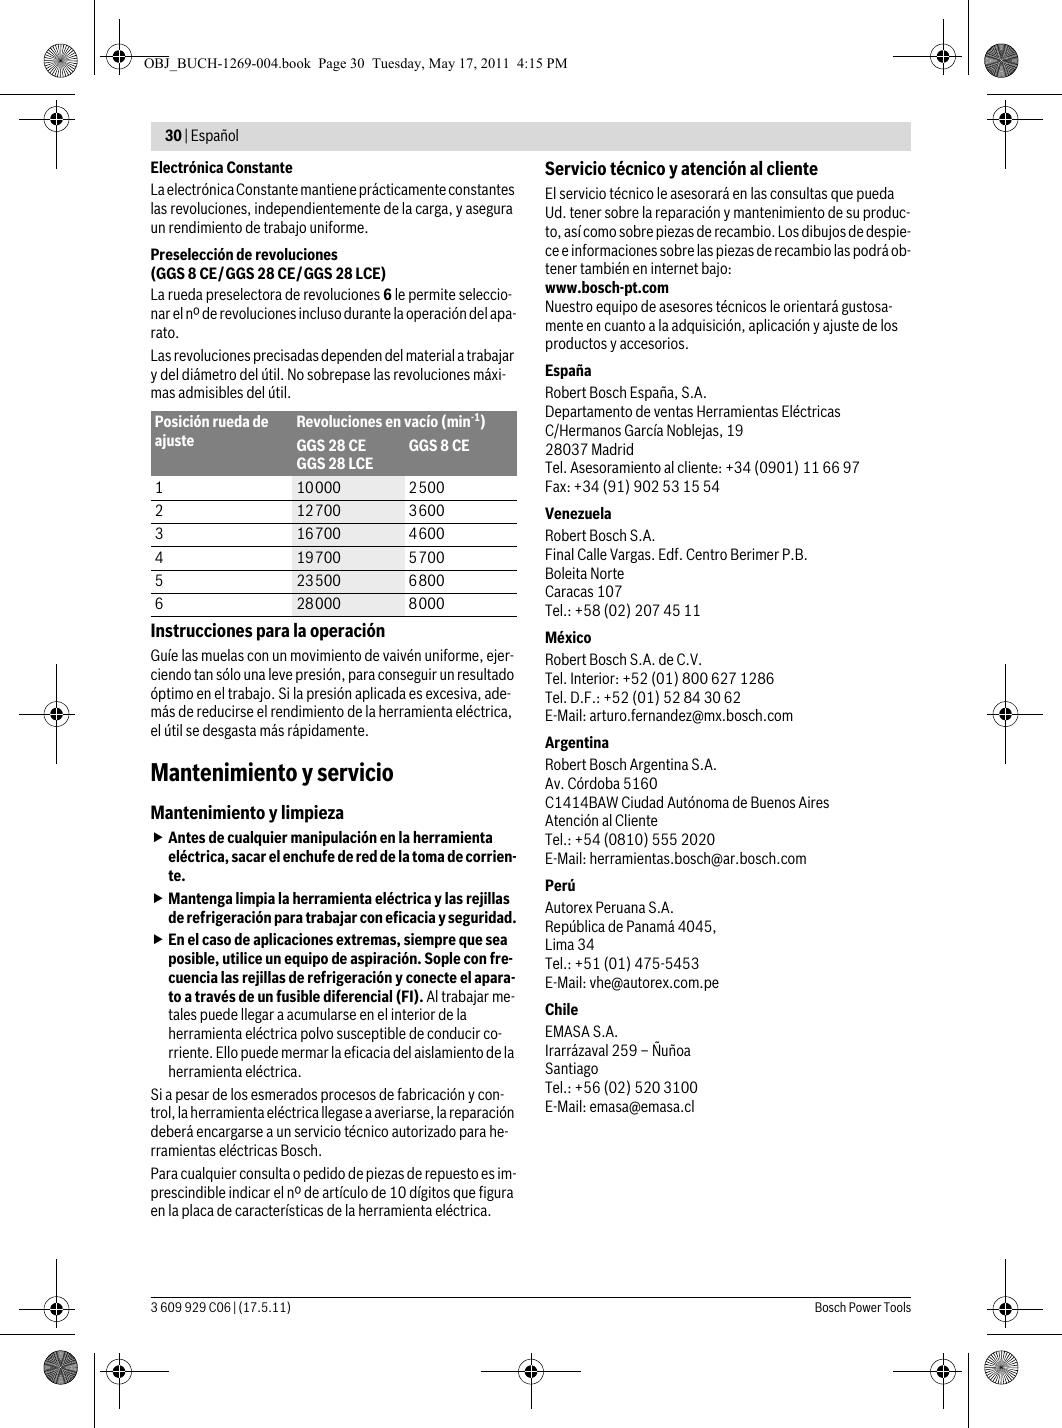 Instruction 3b464bff2c26405ab0da21f18e5611c9